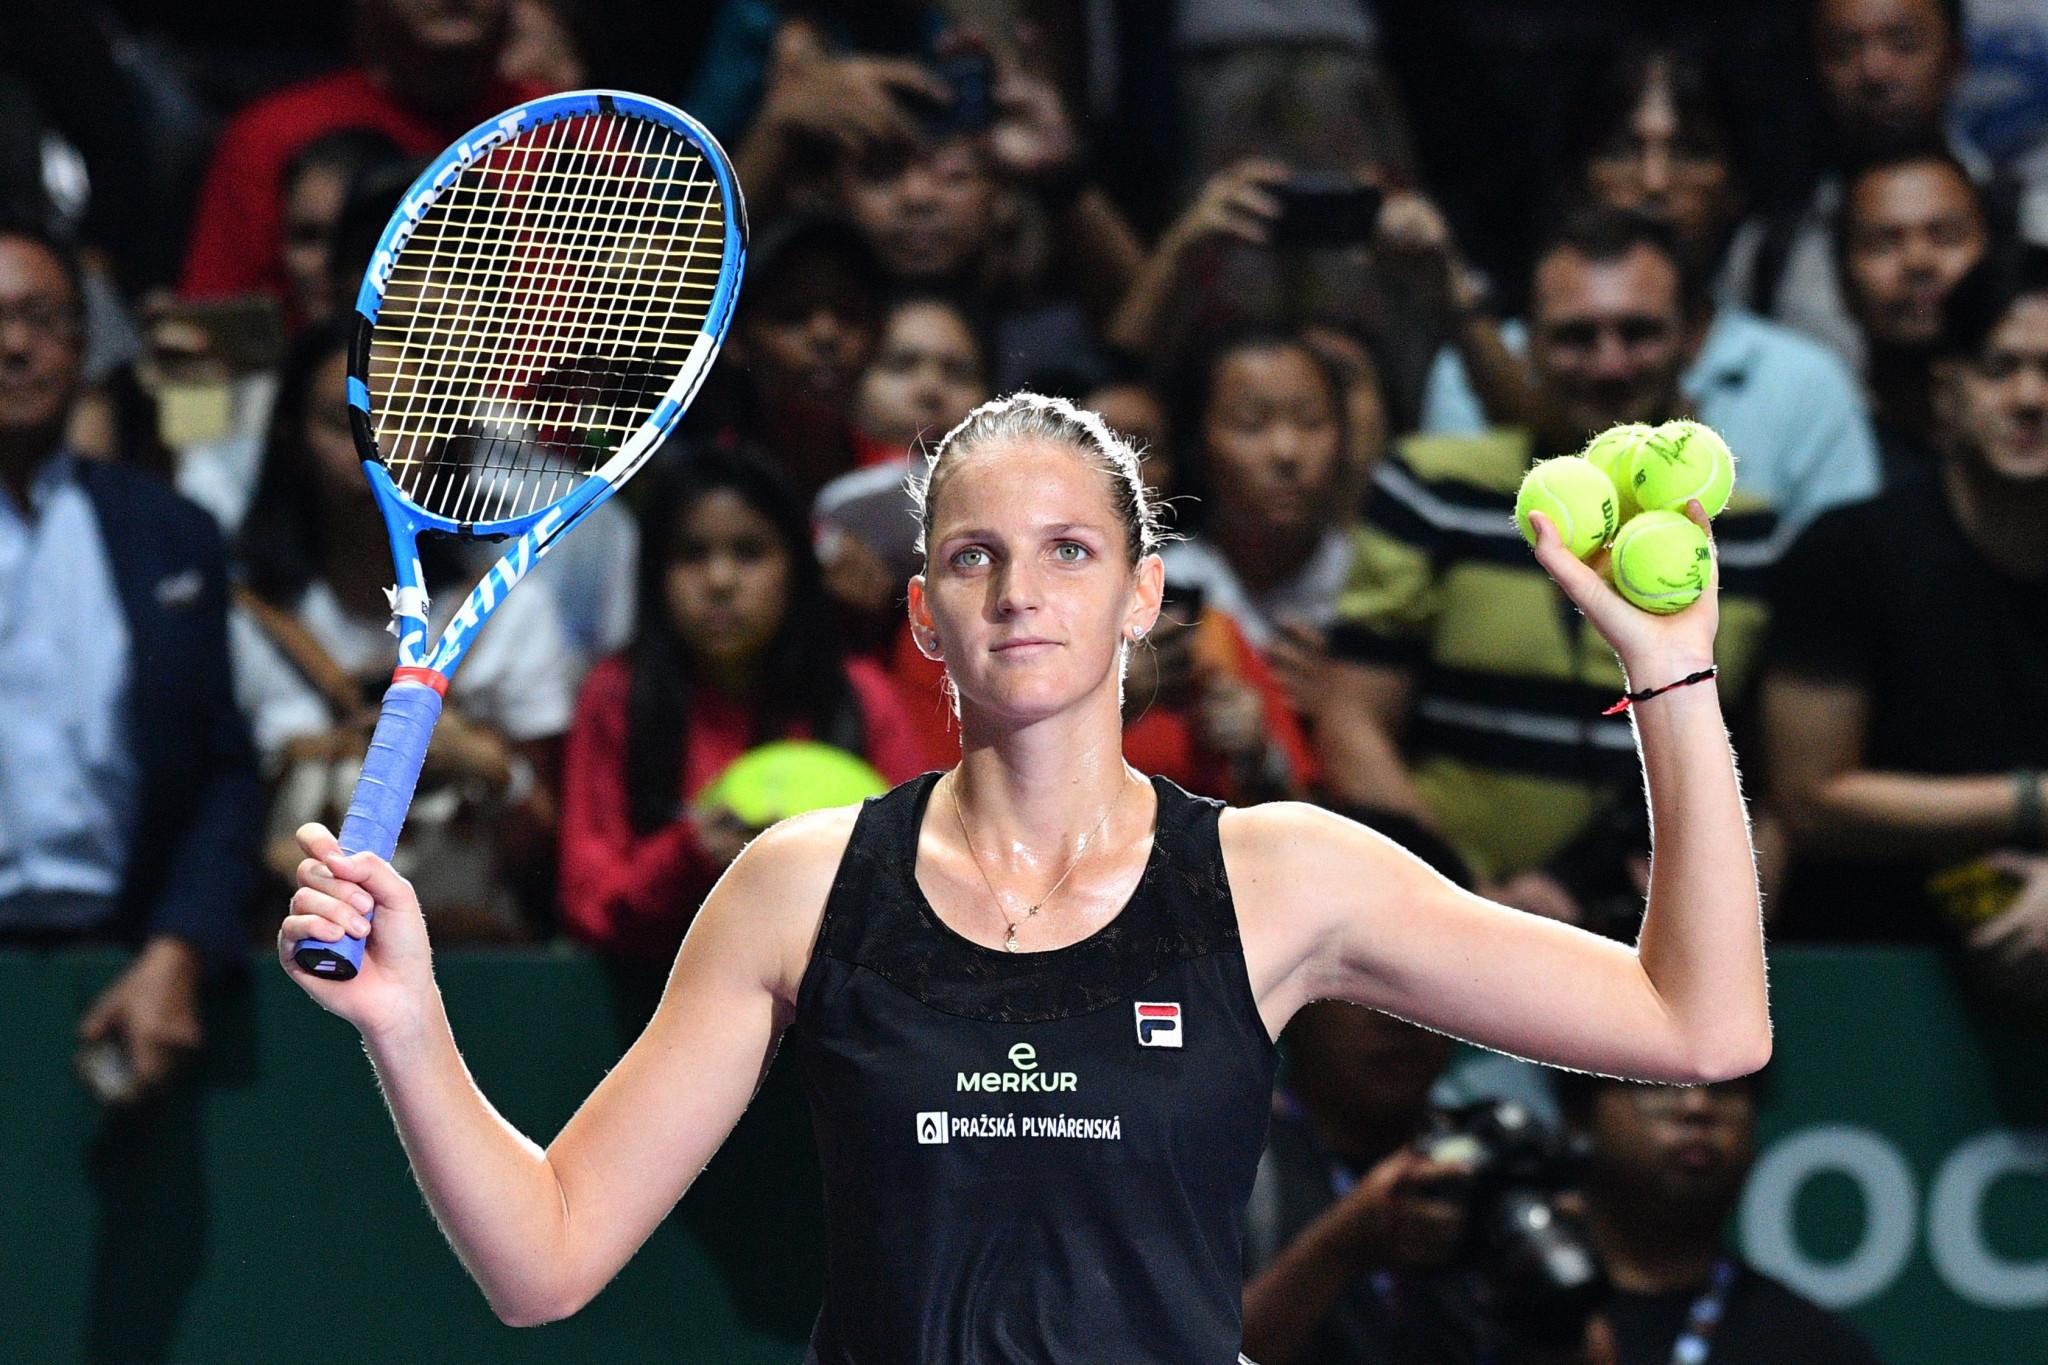 Karolína Plíšková of the Czech Republic celebrates beating Caroline Wozniacki of Denmark in the WTA Finals in Singapore ©Getty Images